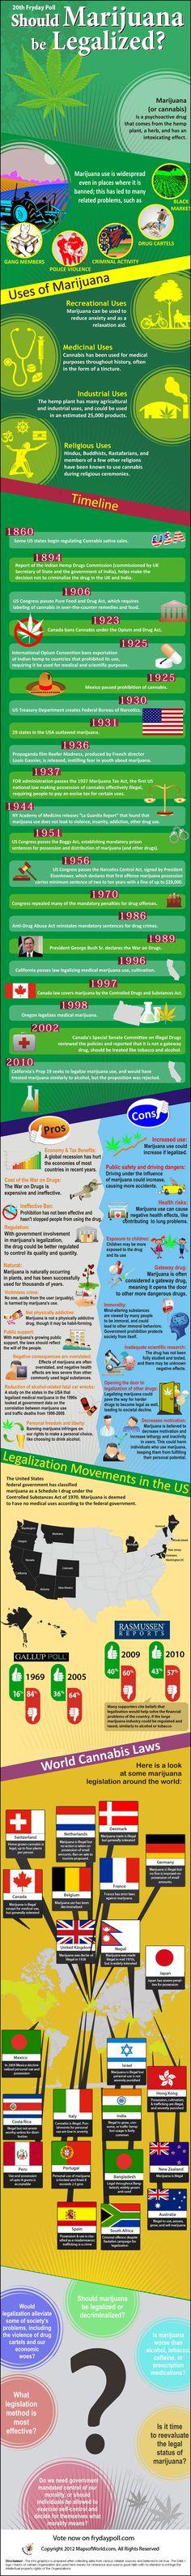 #cannabishealthresearch Infographic - Should Marijuana Be Legalized? http://ordermedicalcannabis.com